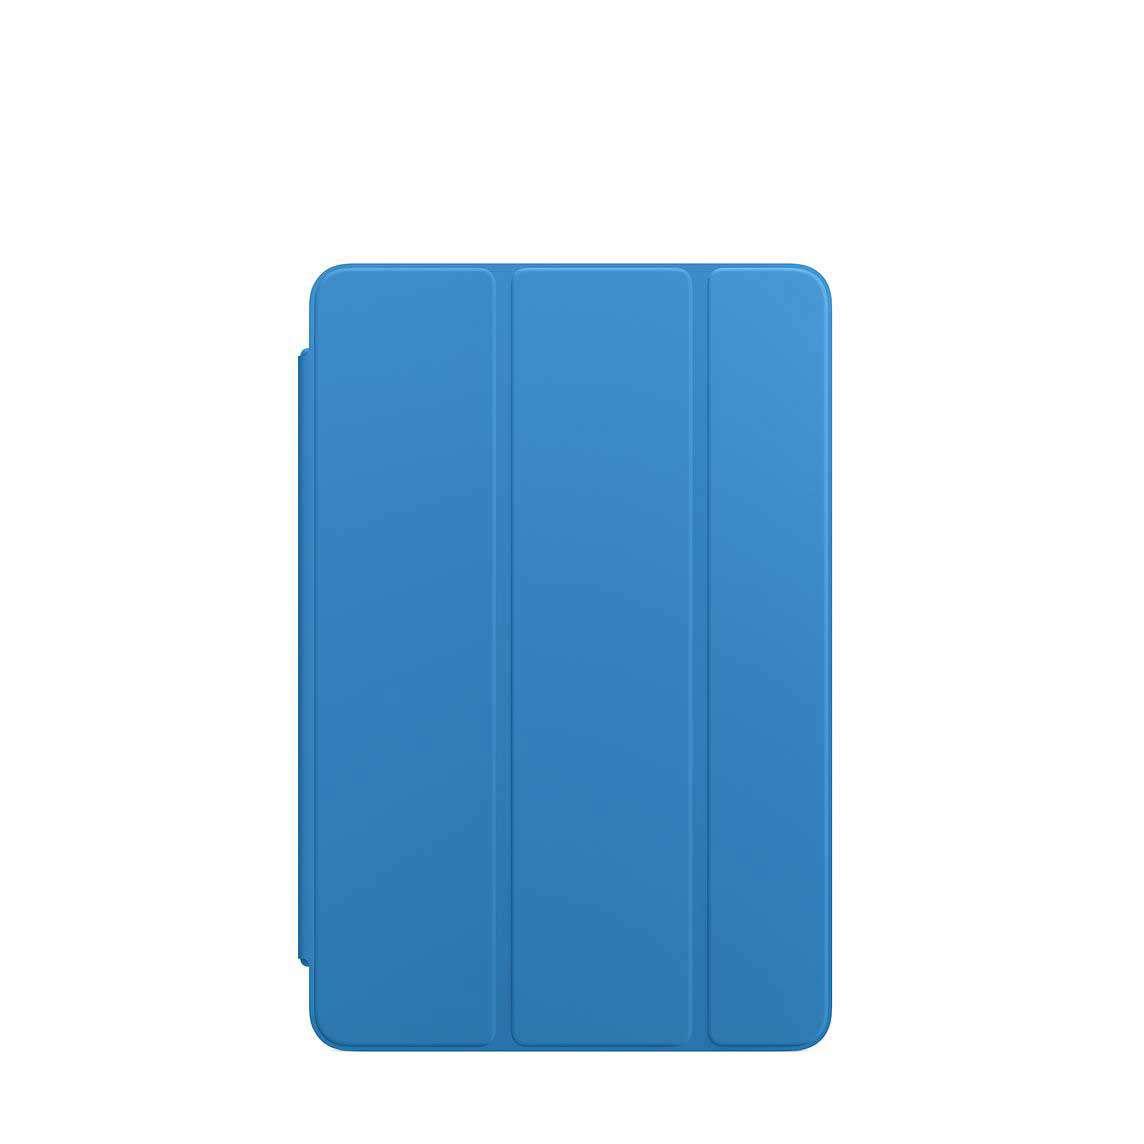 iPad mini için Smart Cover Sörf Mavisi MY1V2ZM/A